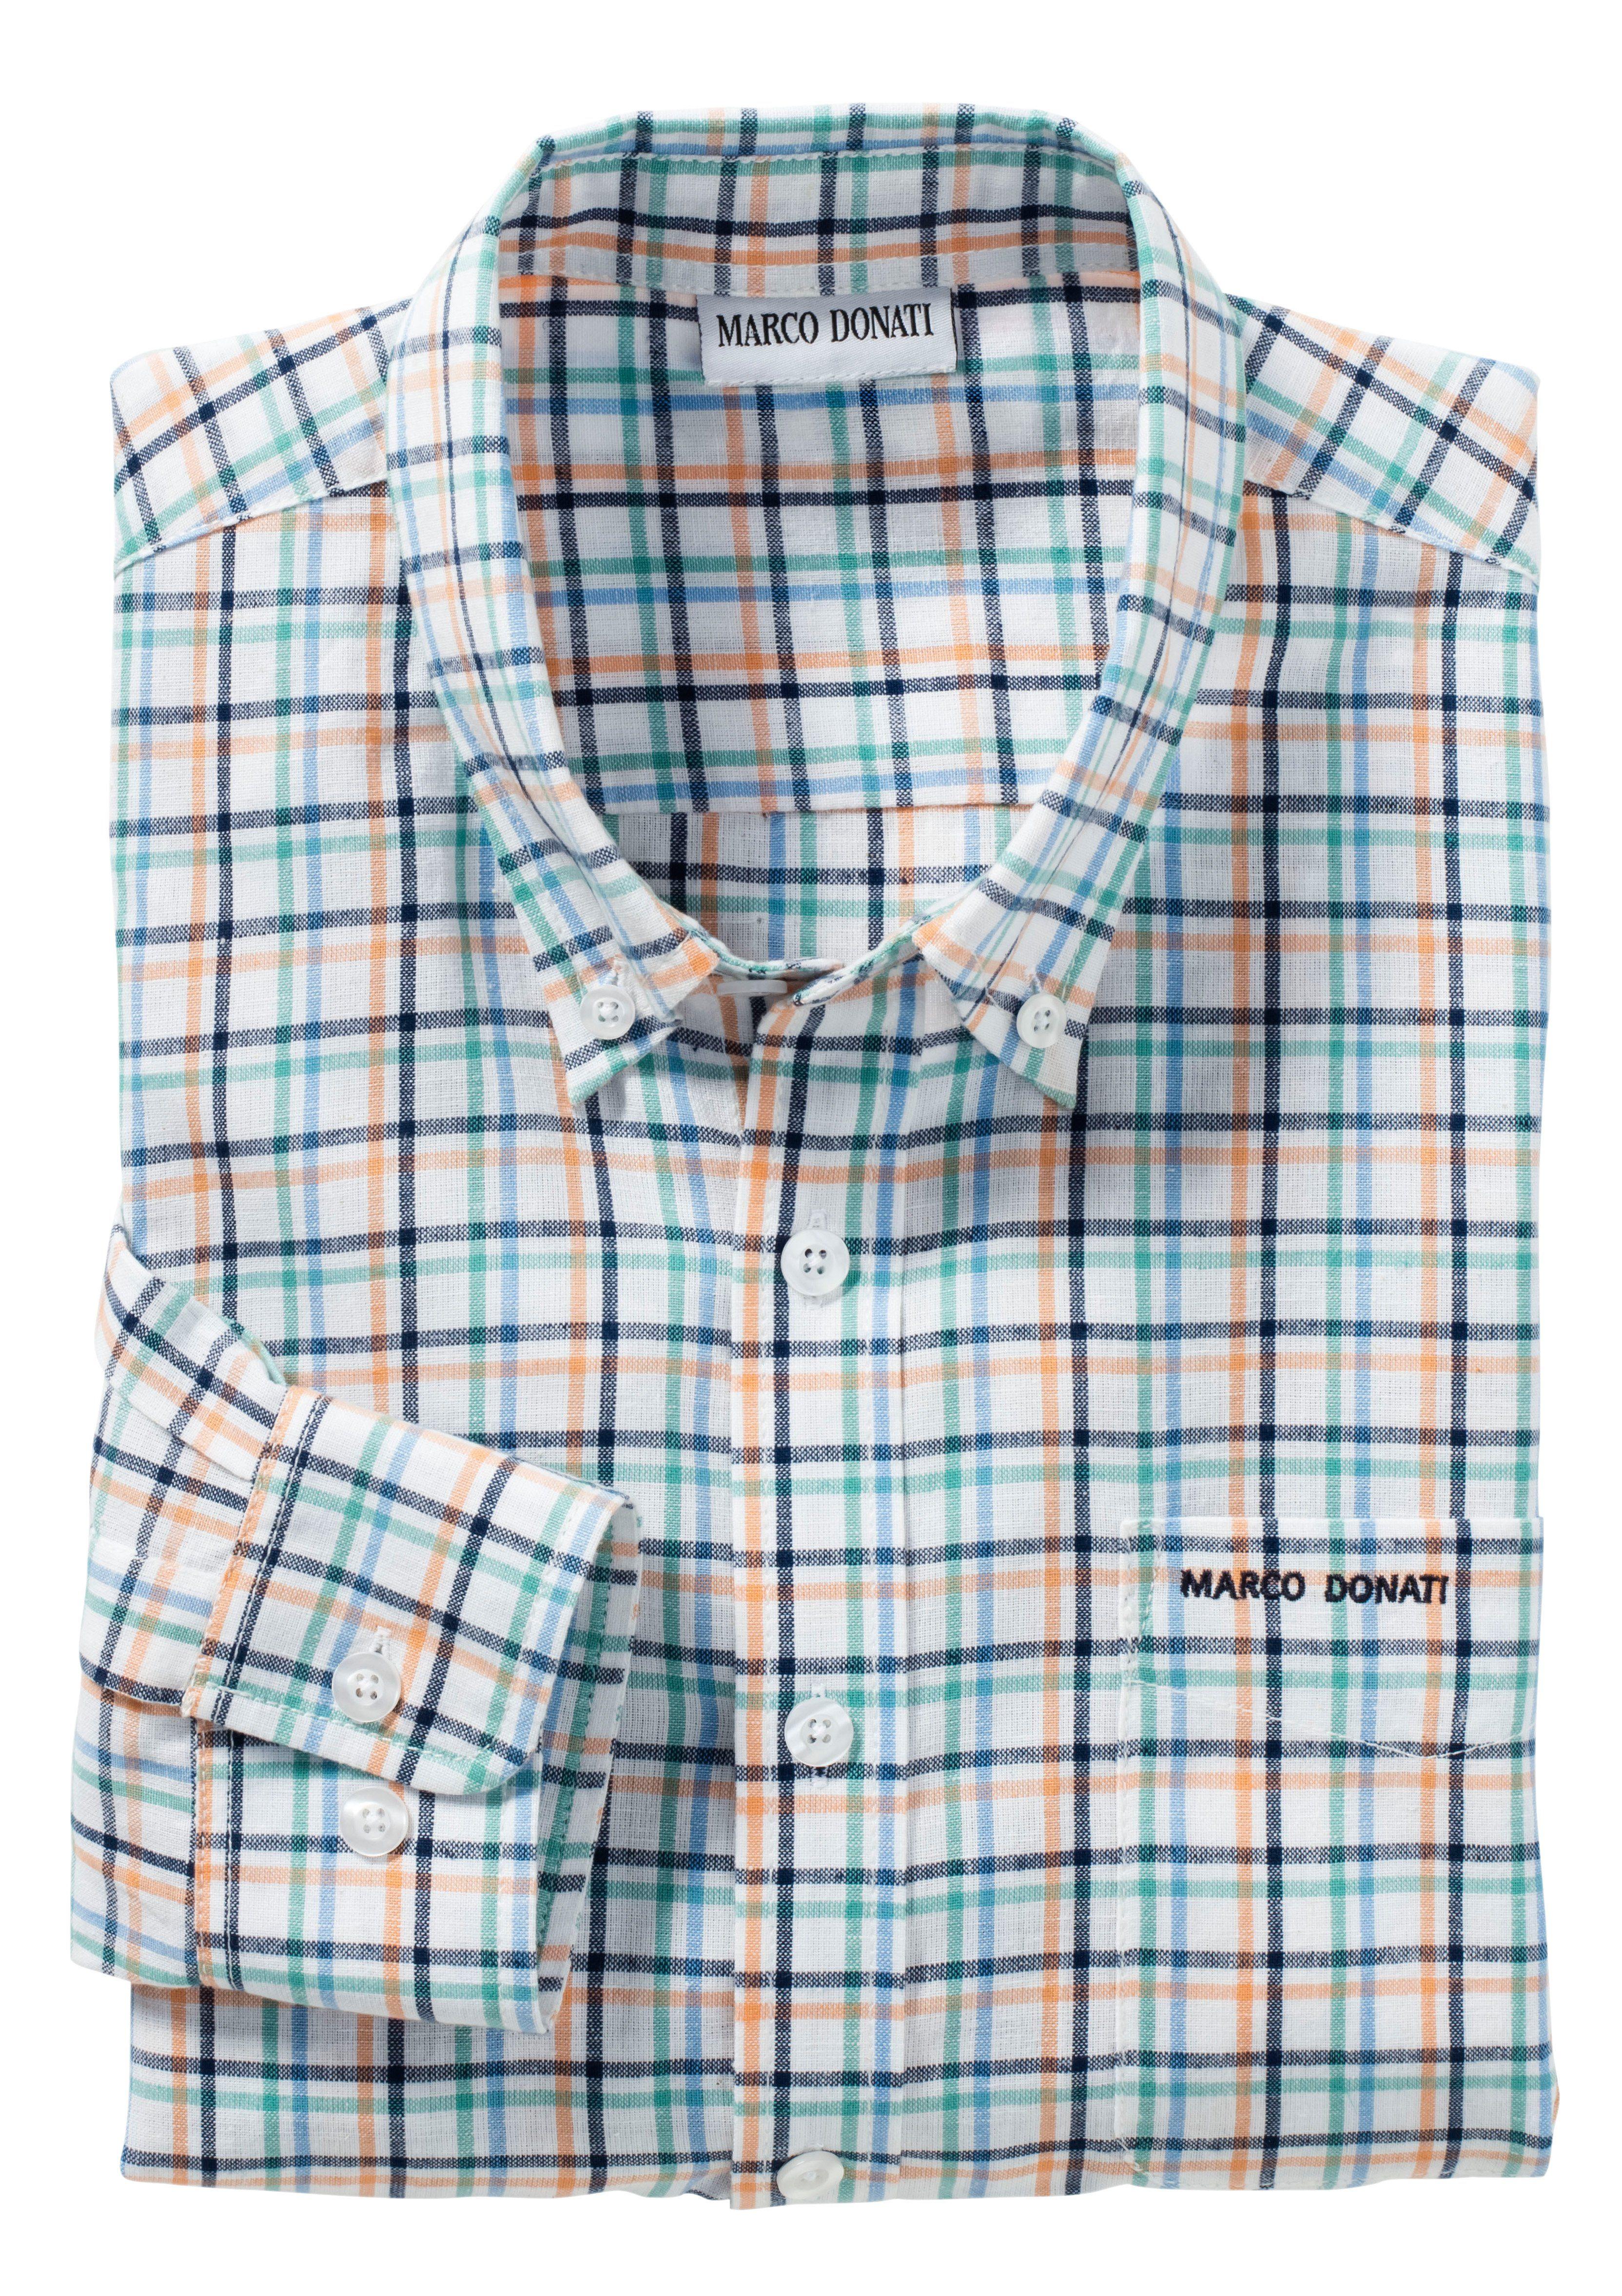 Marco Donati Langarm-Hemd in Leinenstruktur